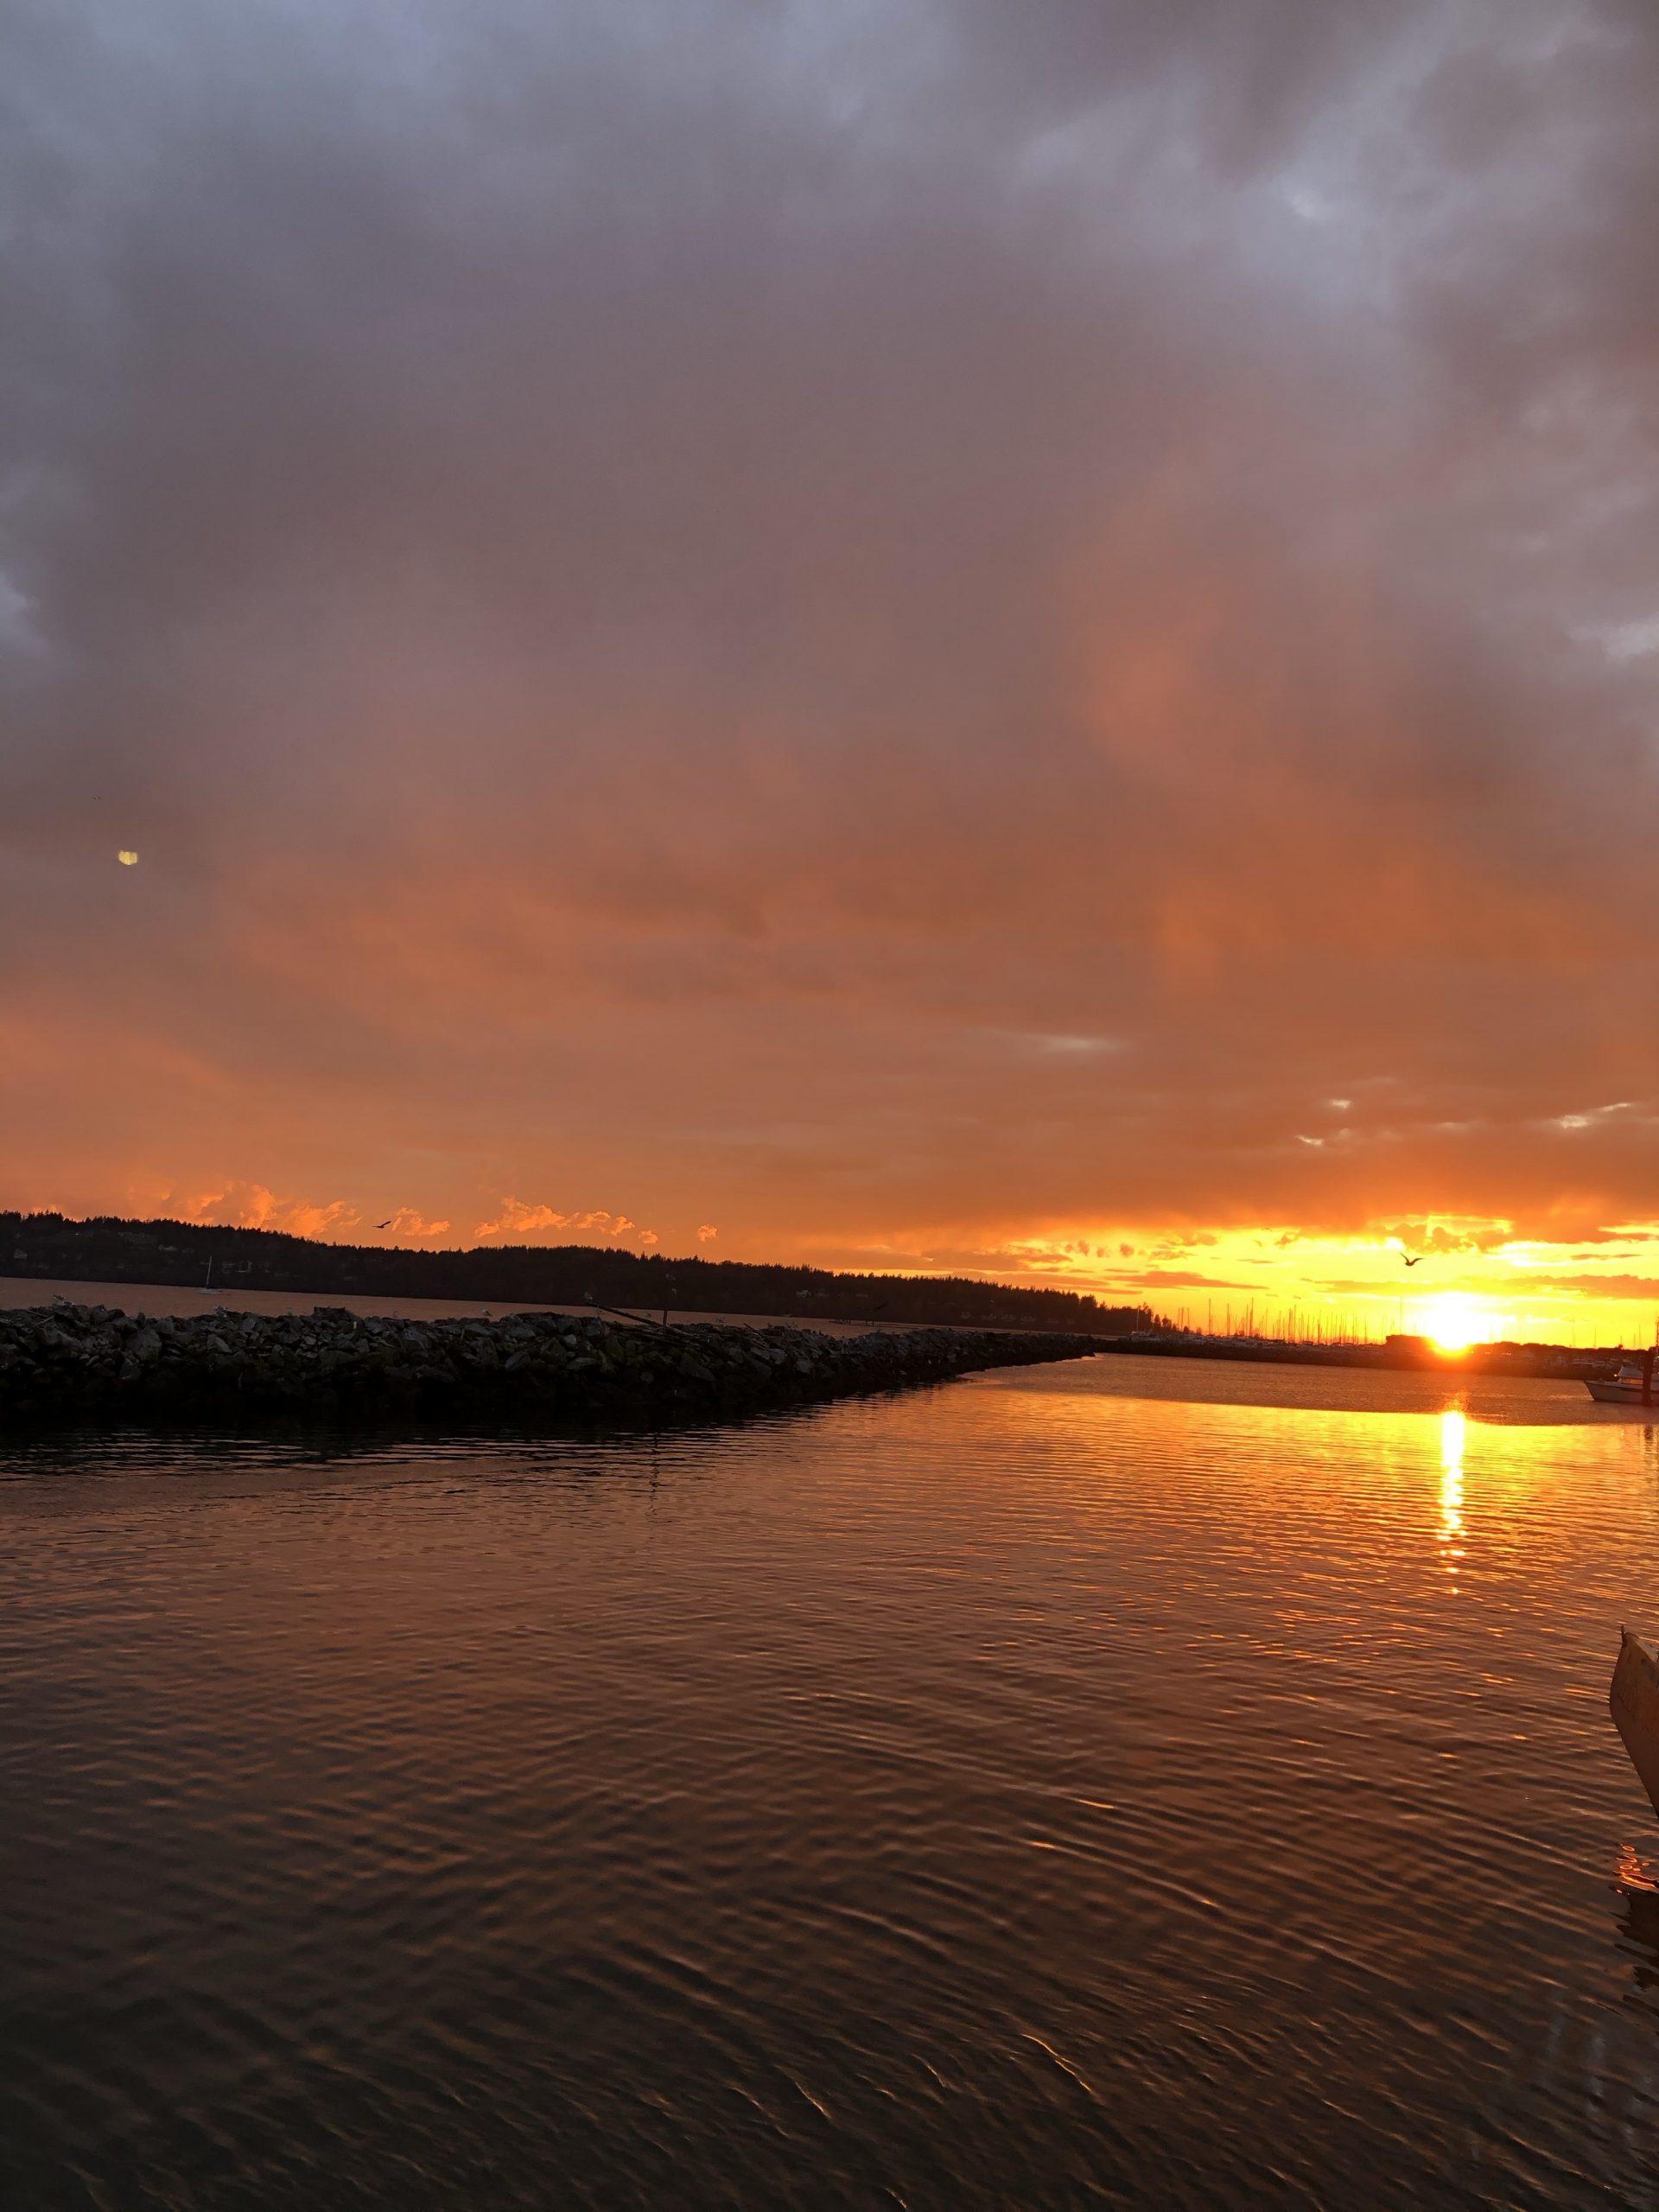 Sunset over Blaine